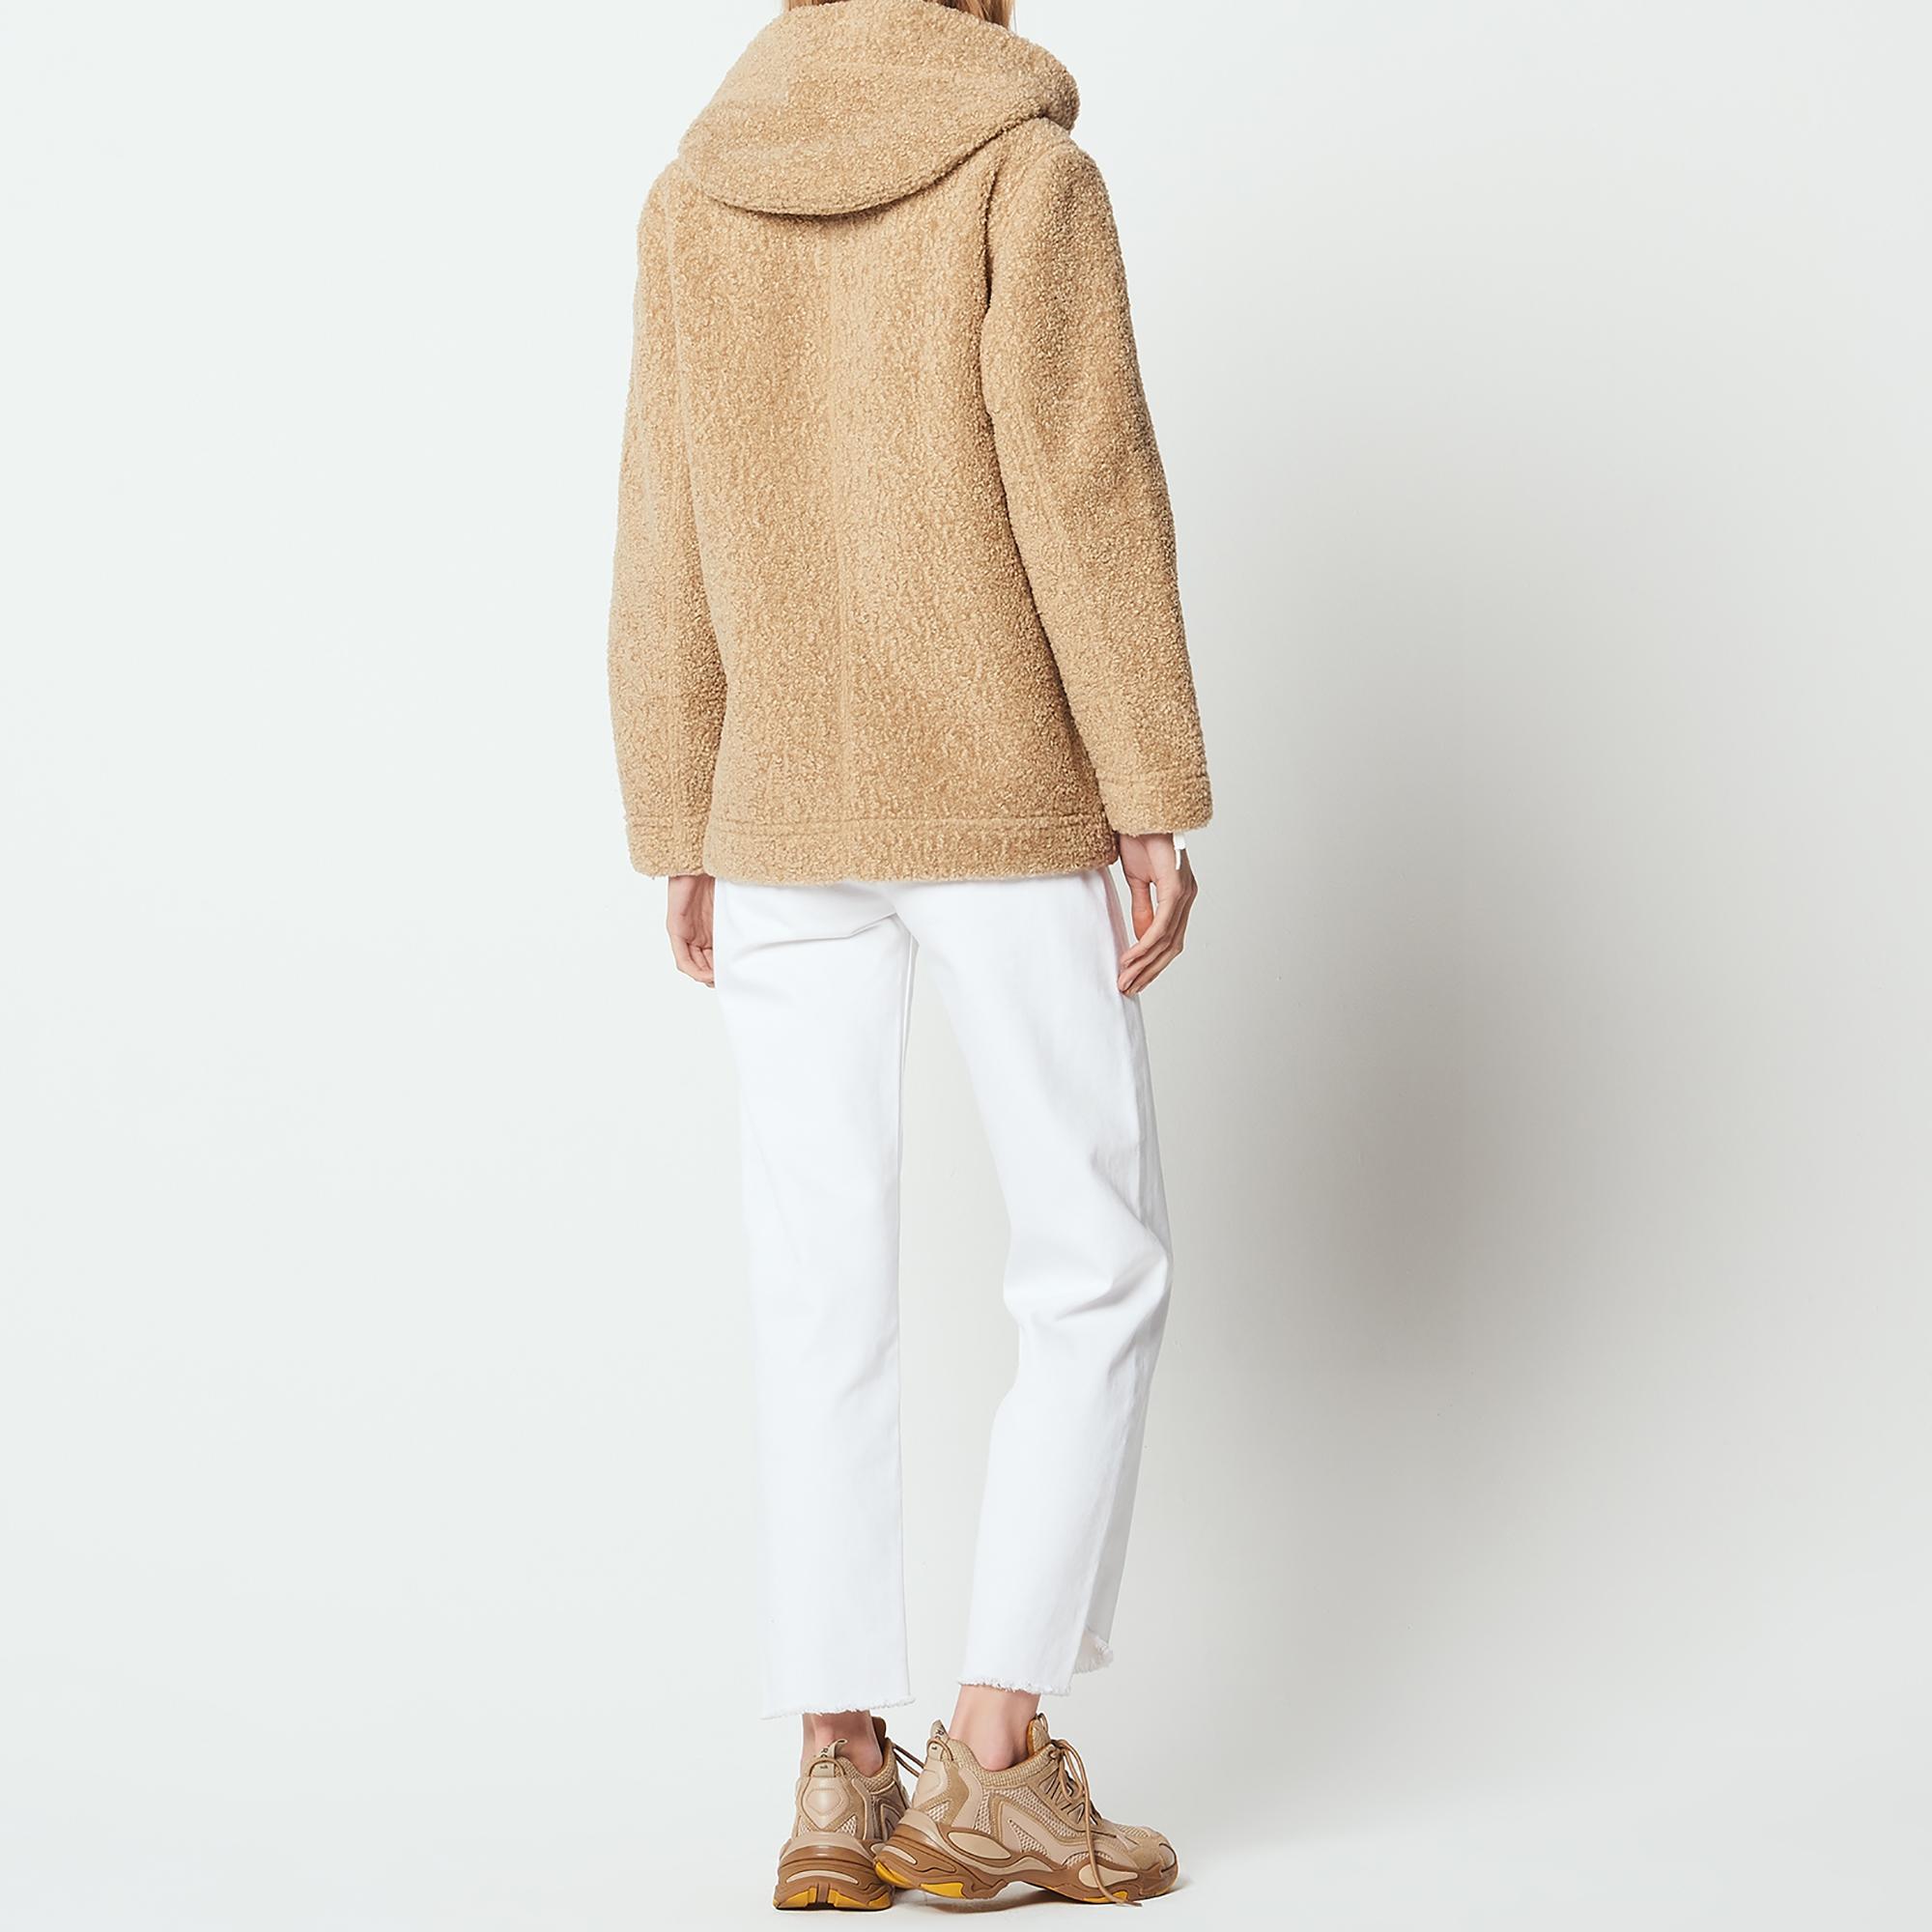 Kurzer mantel camel